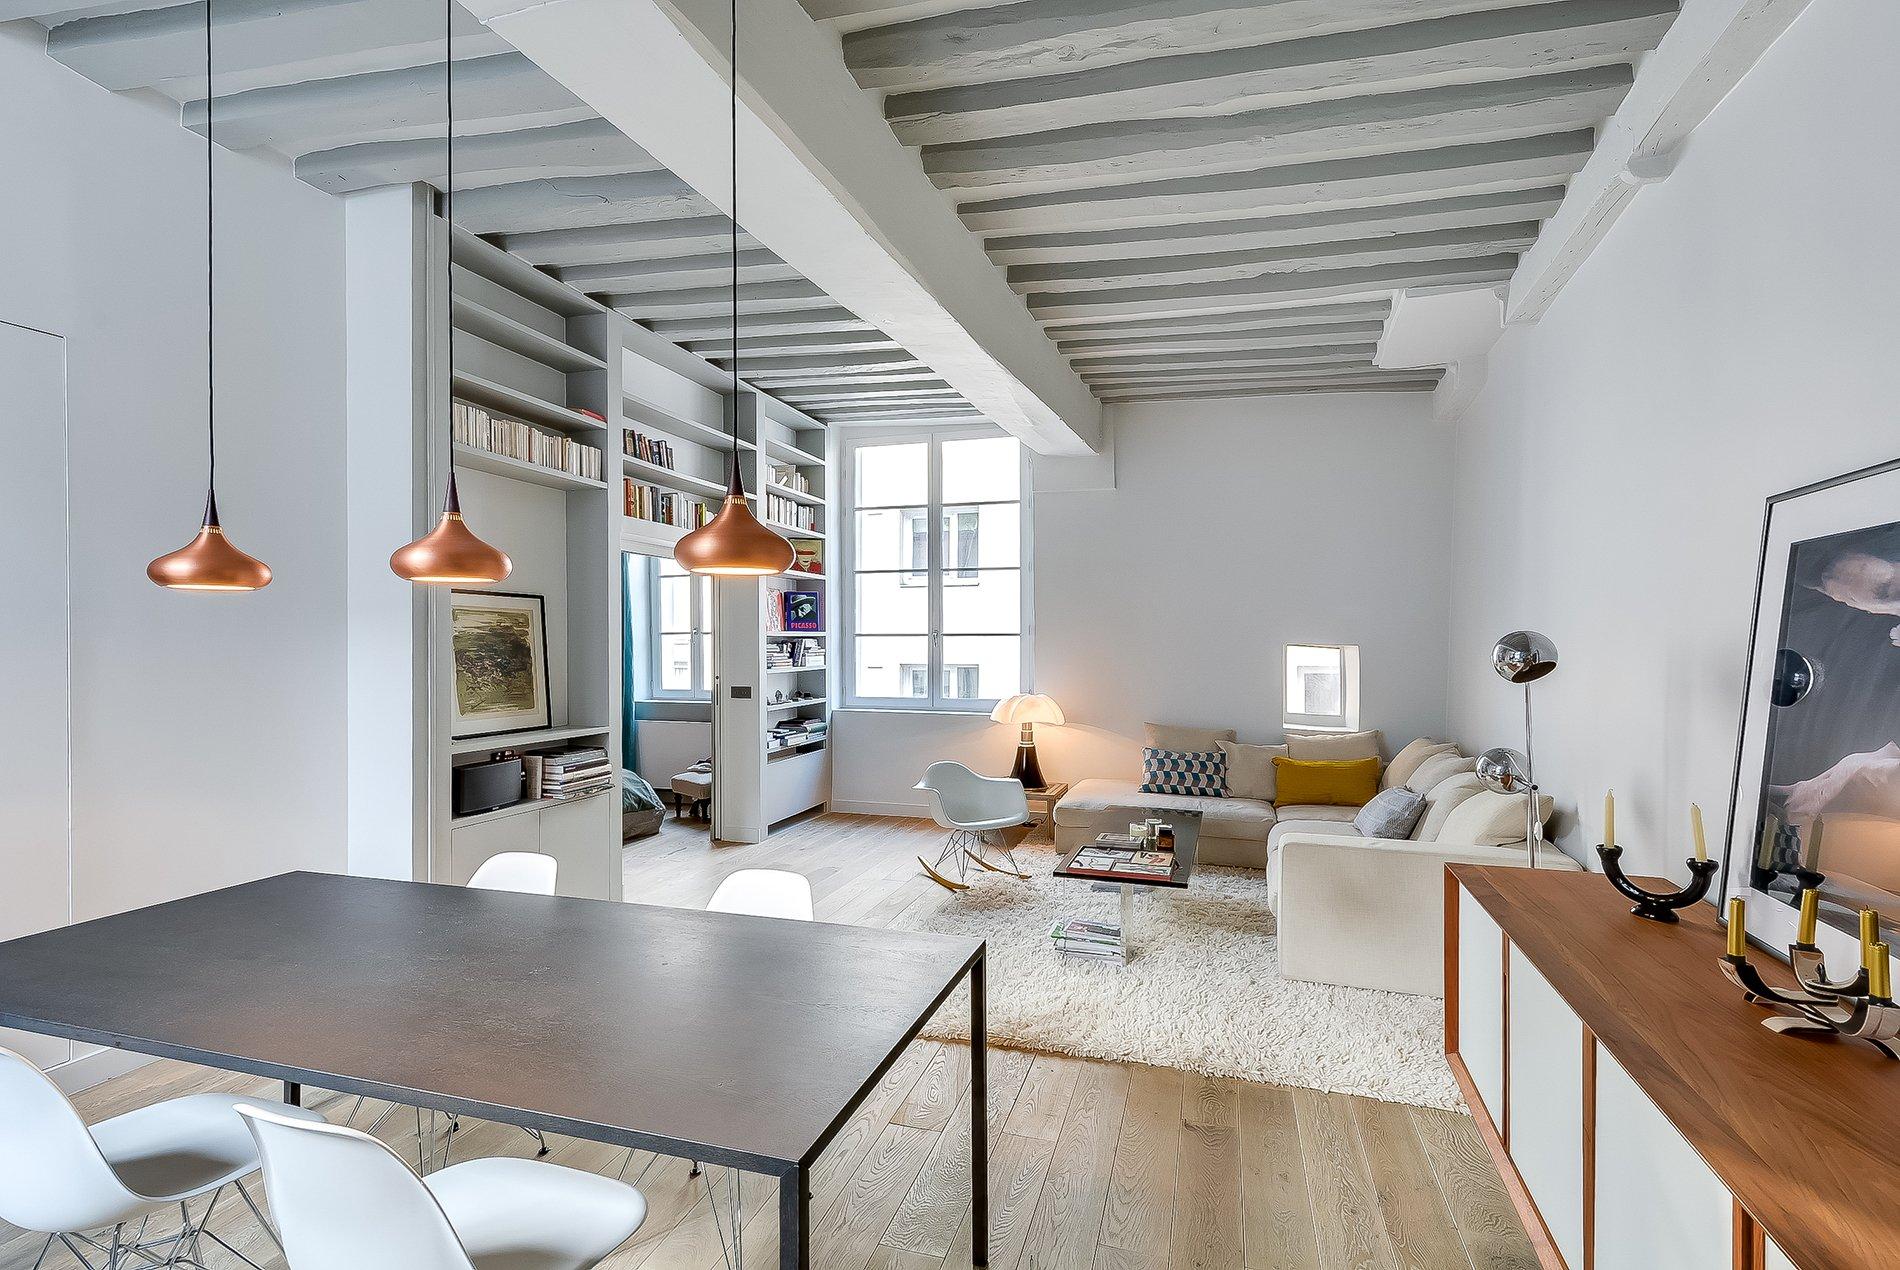 Ikea Slaapkamer Designer : Bright yet soft paris apartment design by tatiana nicol